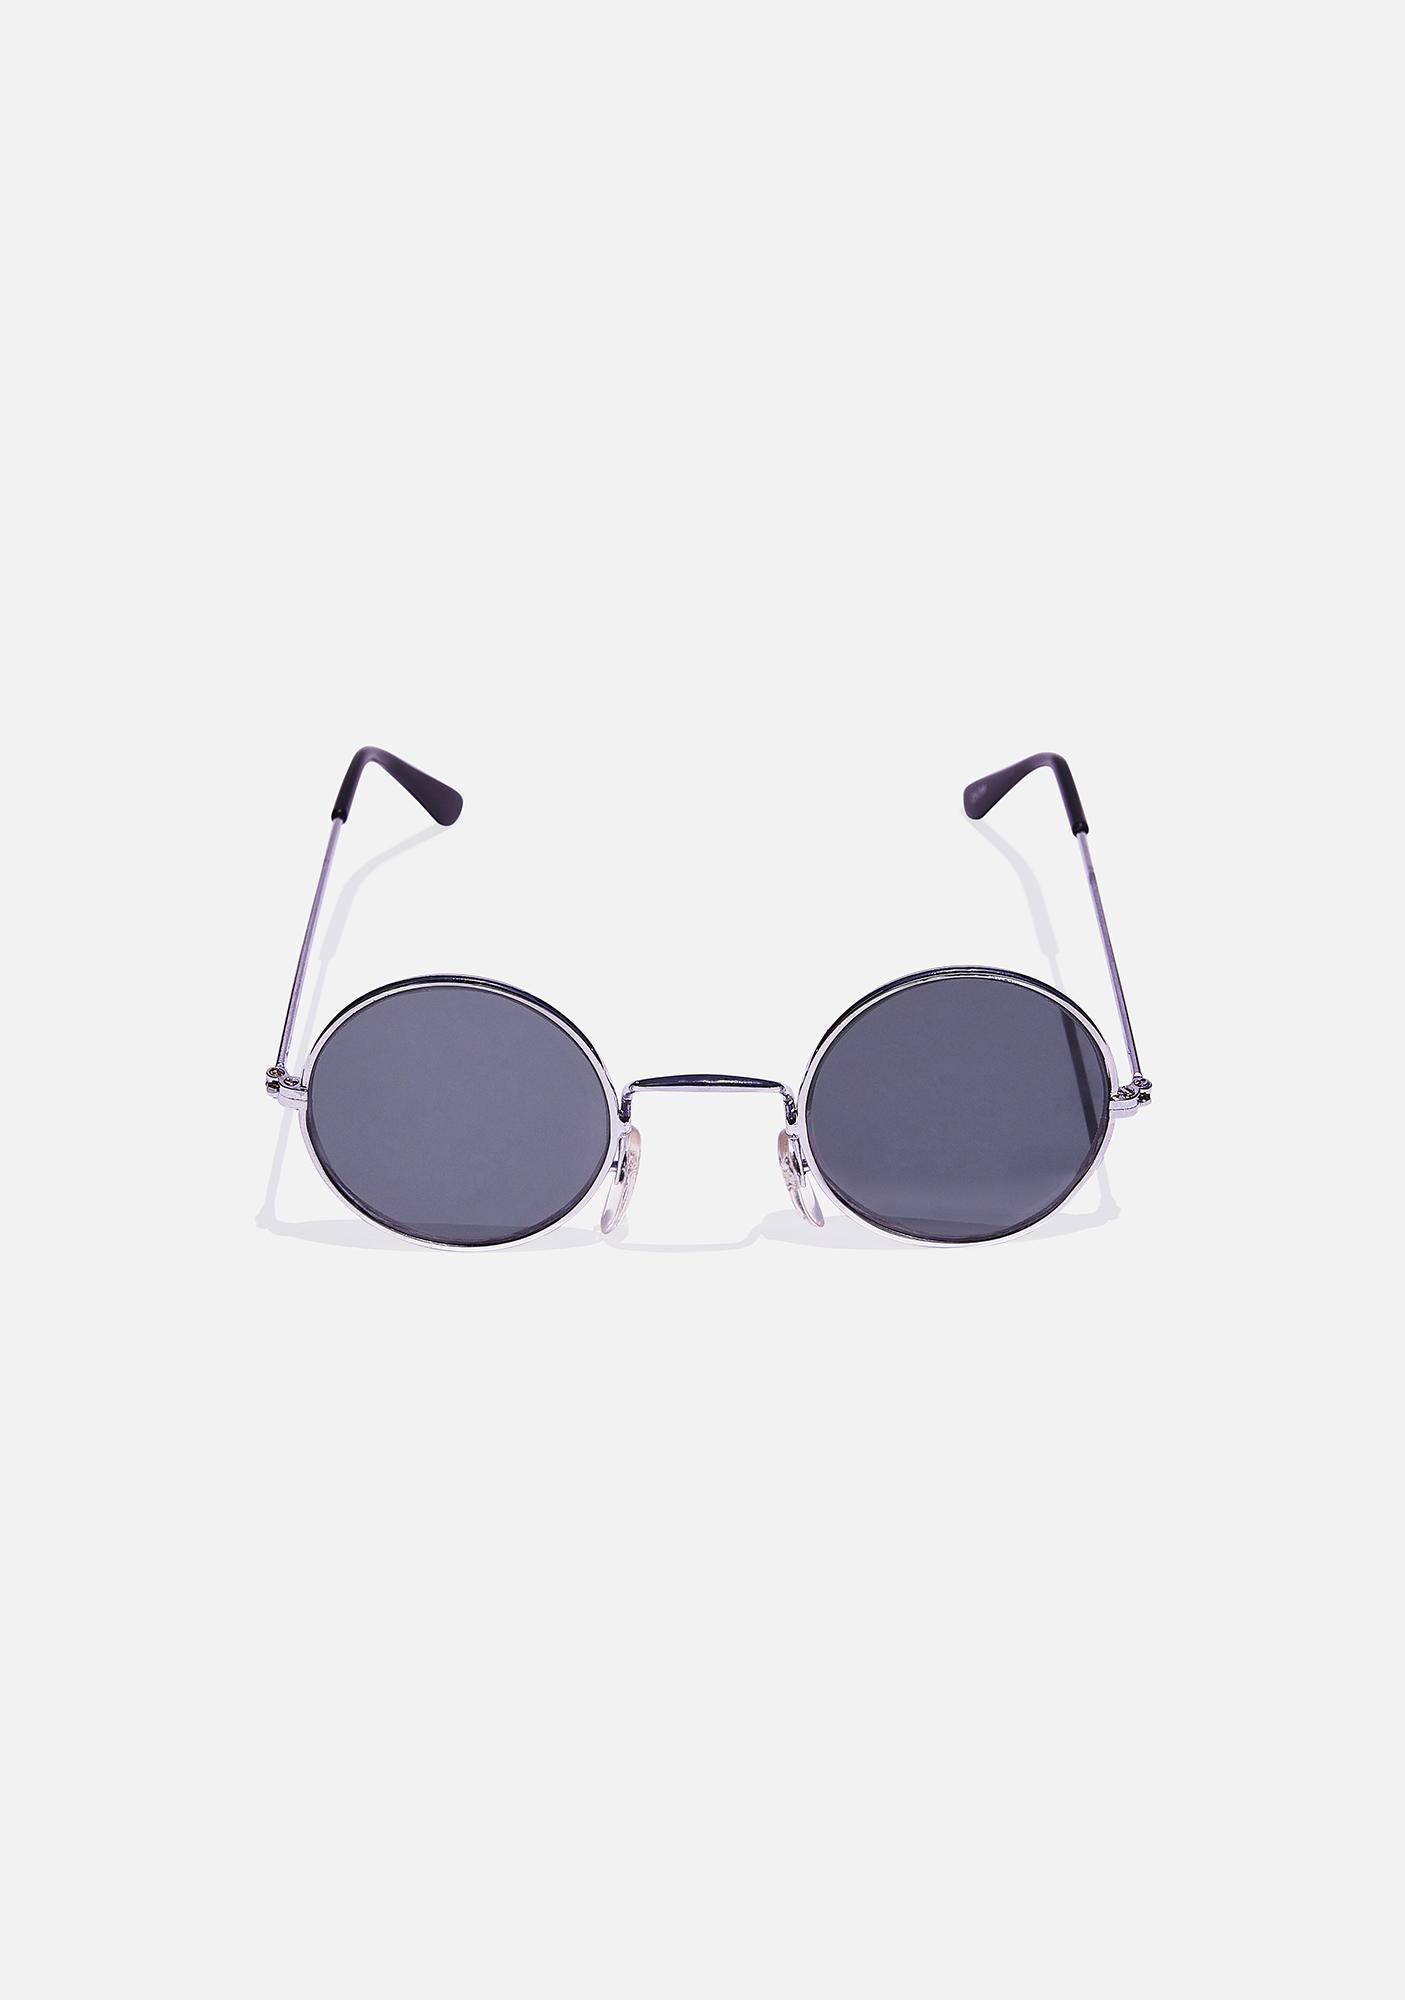 Good Times Eyewear Koala Hologram Round Sunglasses